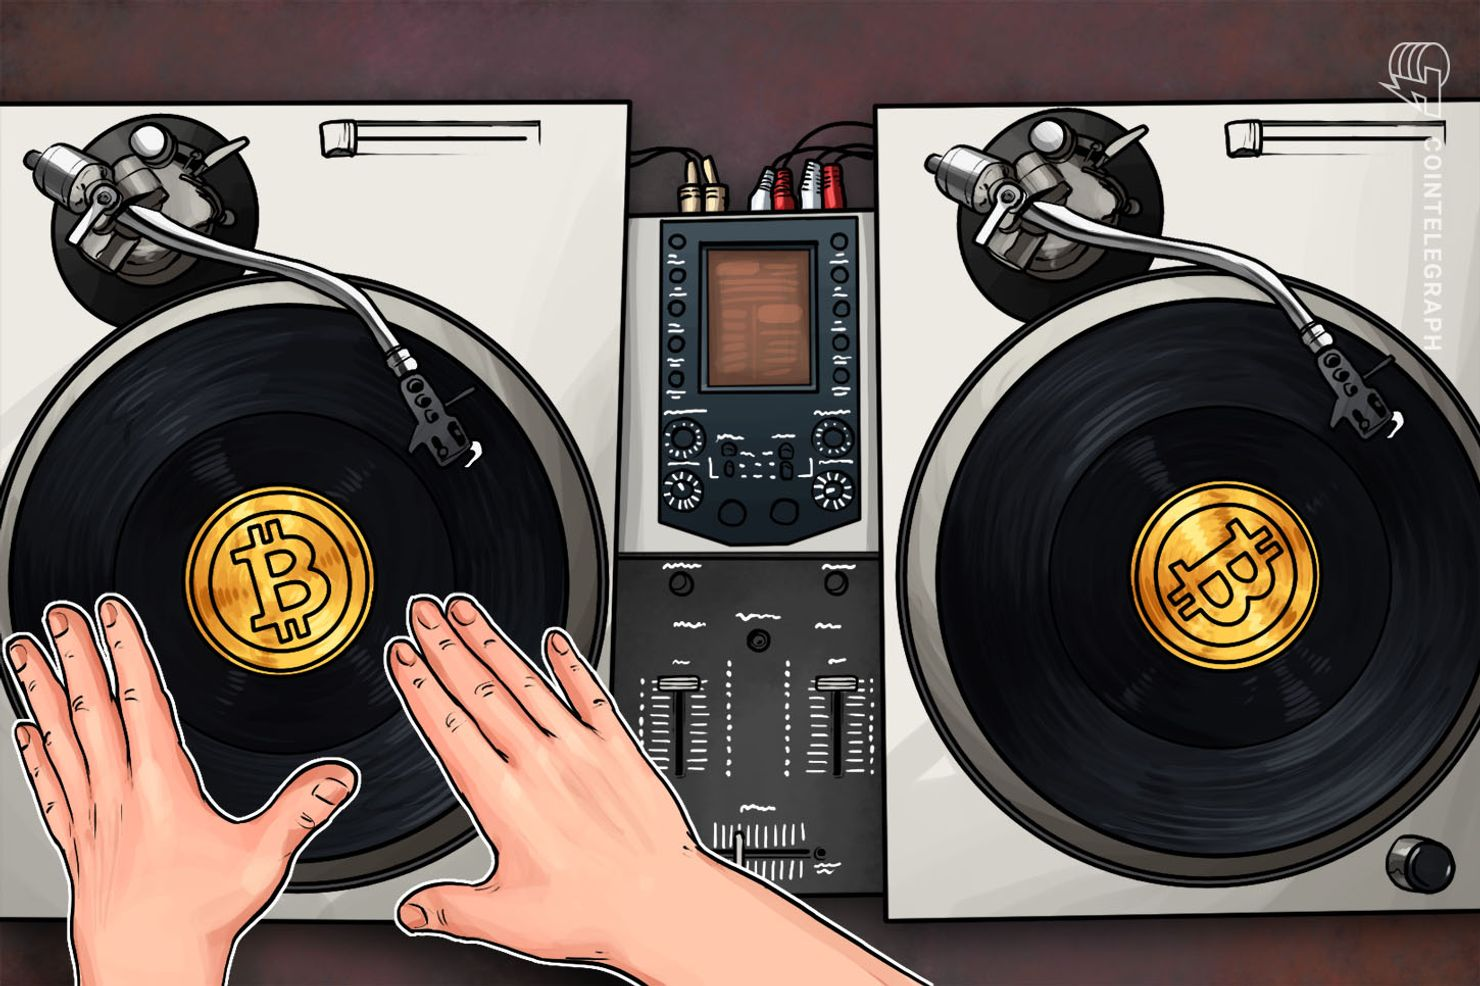 Bitcoin Gets a Mention on Rapper Eminem's New Album 'Kamikaze'